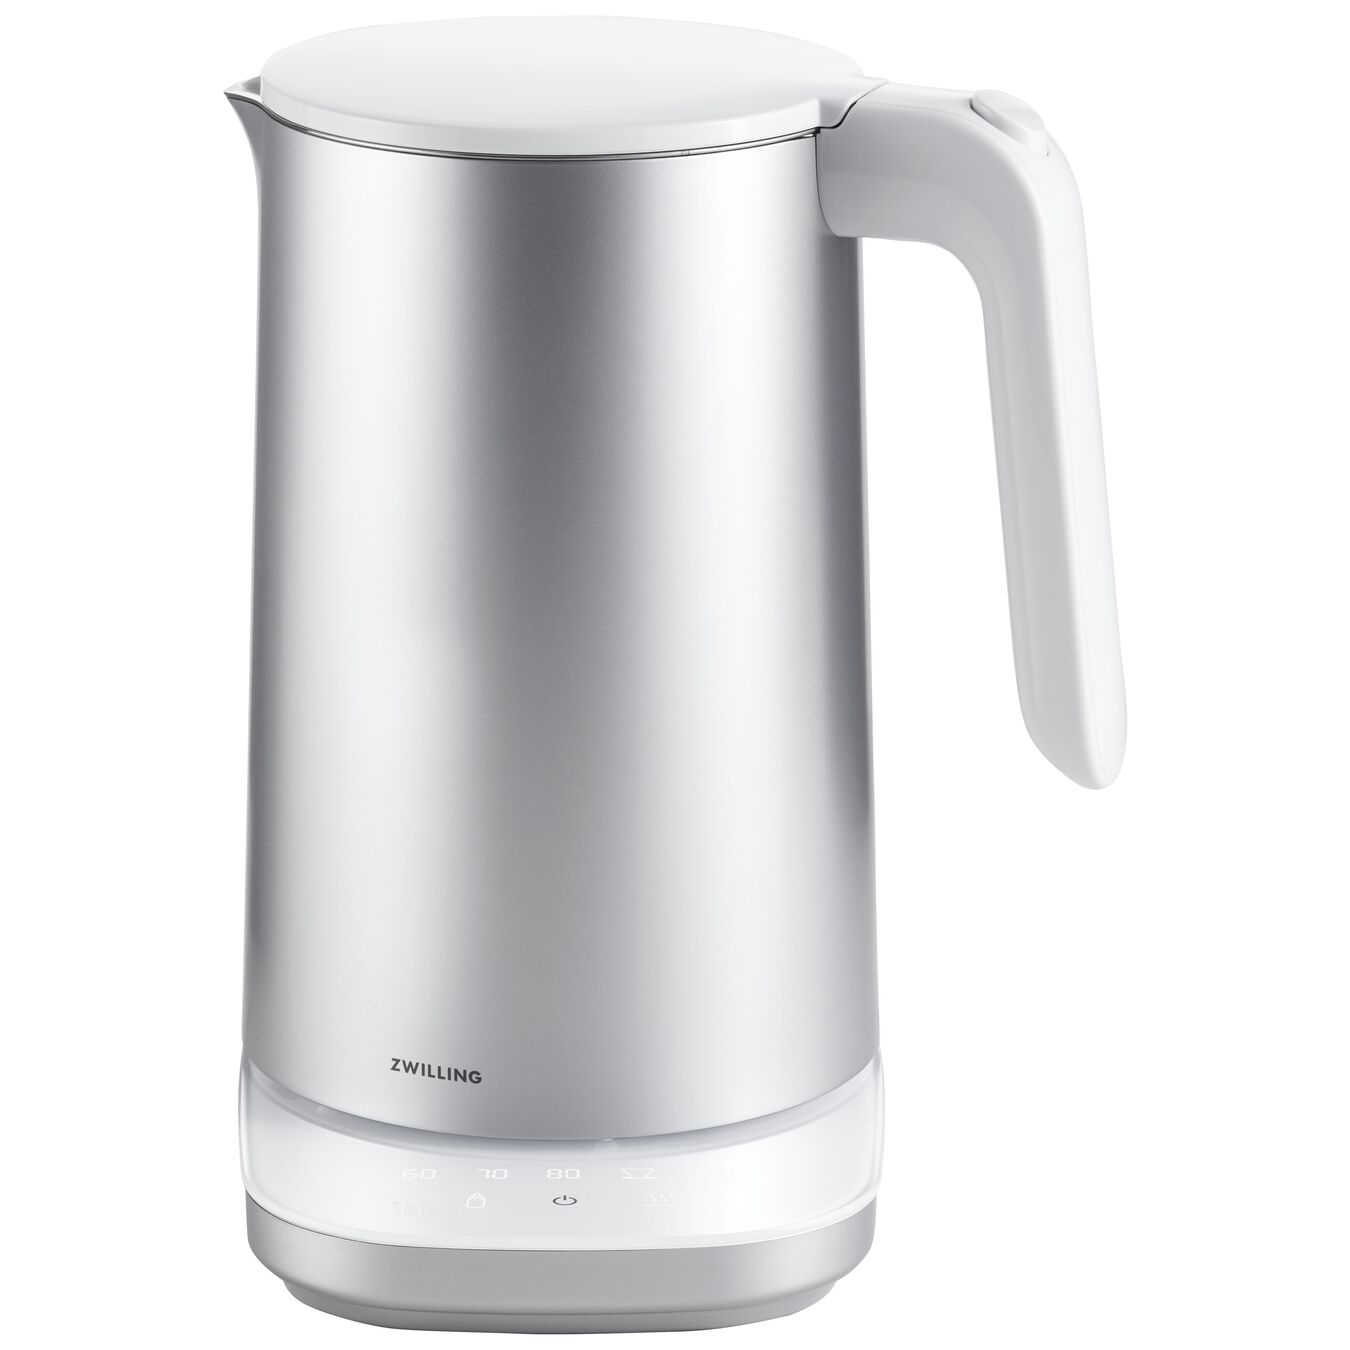 Wasserkocher Pro, 1,5 l, Silber,,large 1